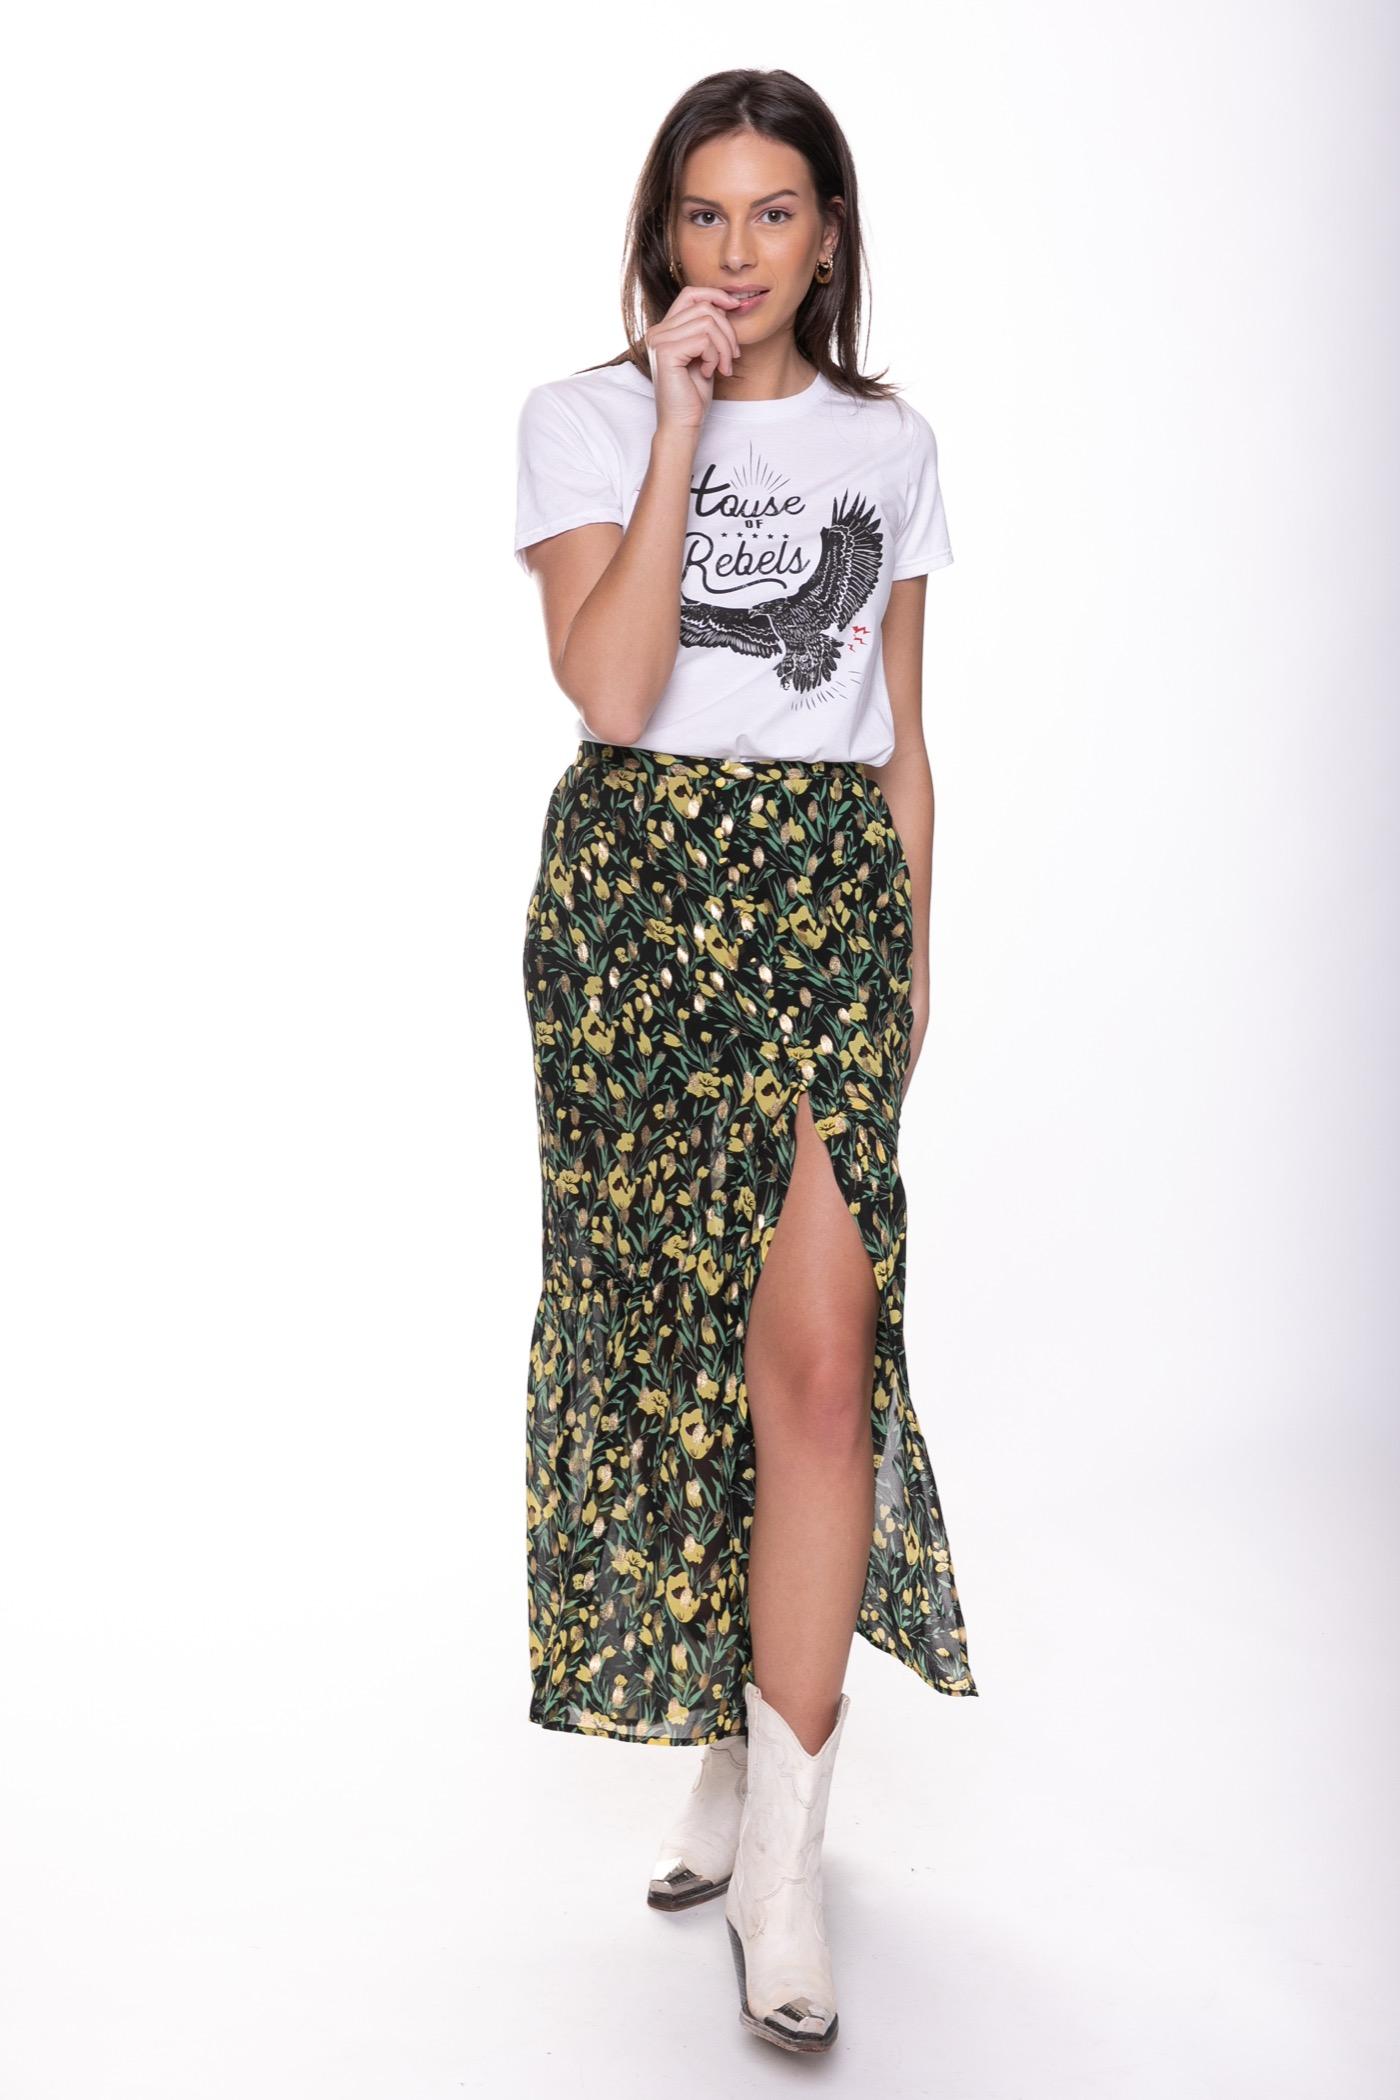 Zwarte dames rok met Gele bloemenprint Colourful Rebel - Rive Flower